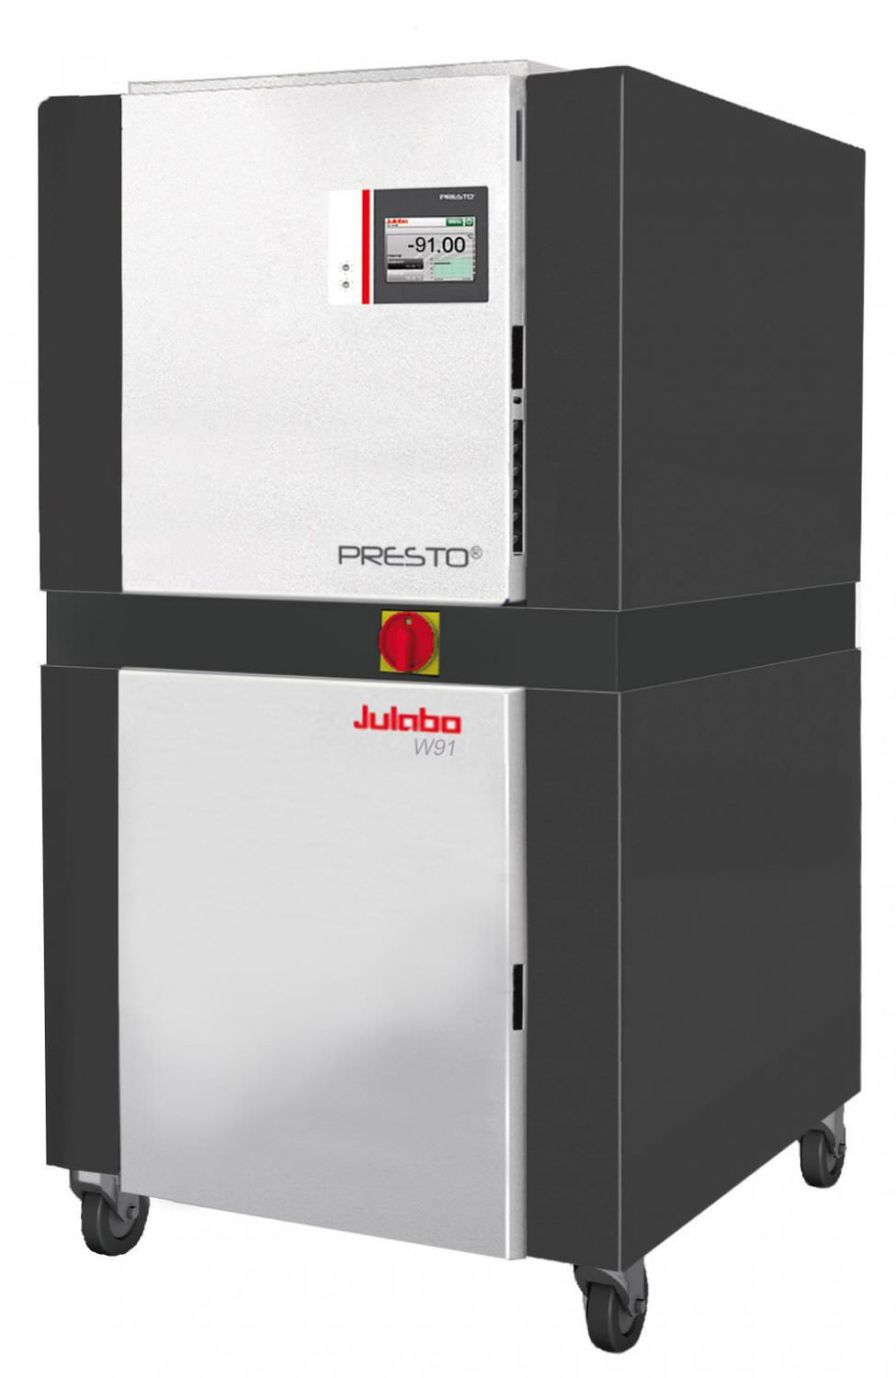 Laboratory thermostat / process -91 °C ... +250 °C | PRESTO® W91tt Julabo